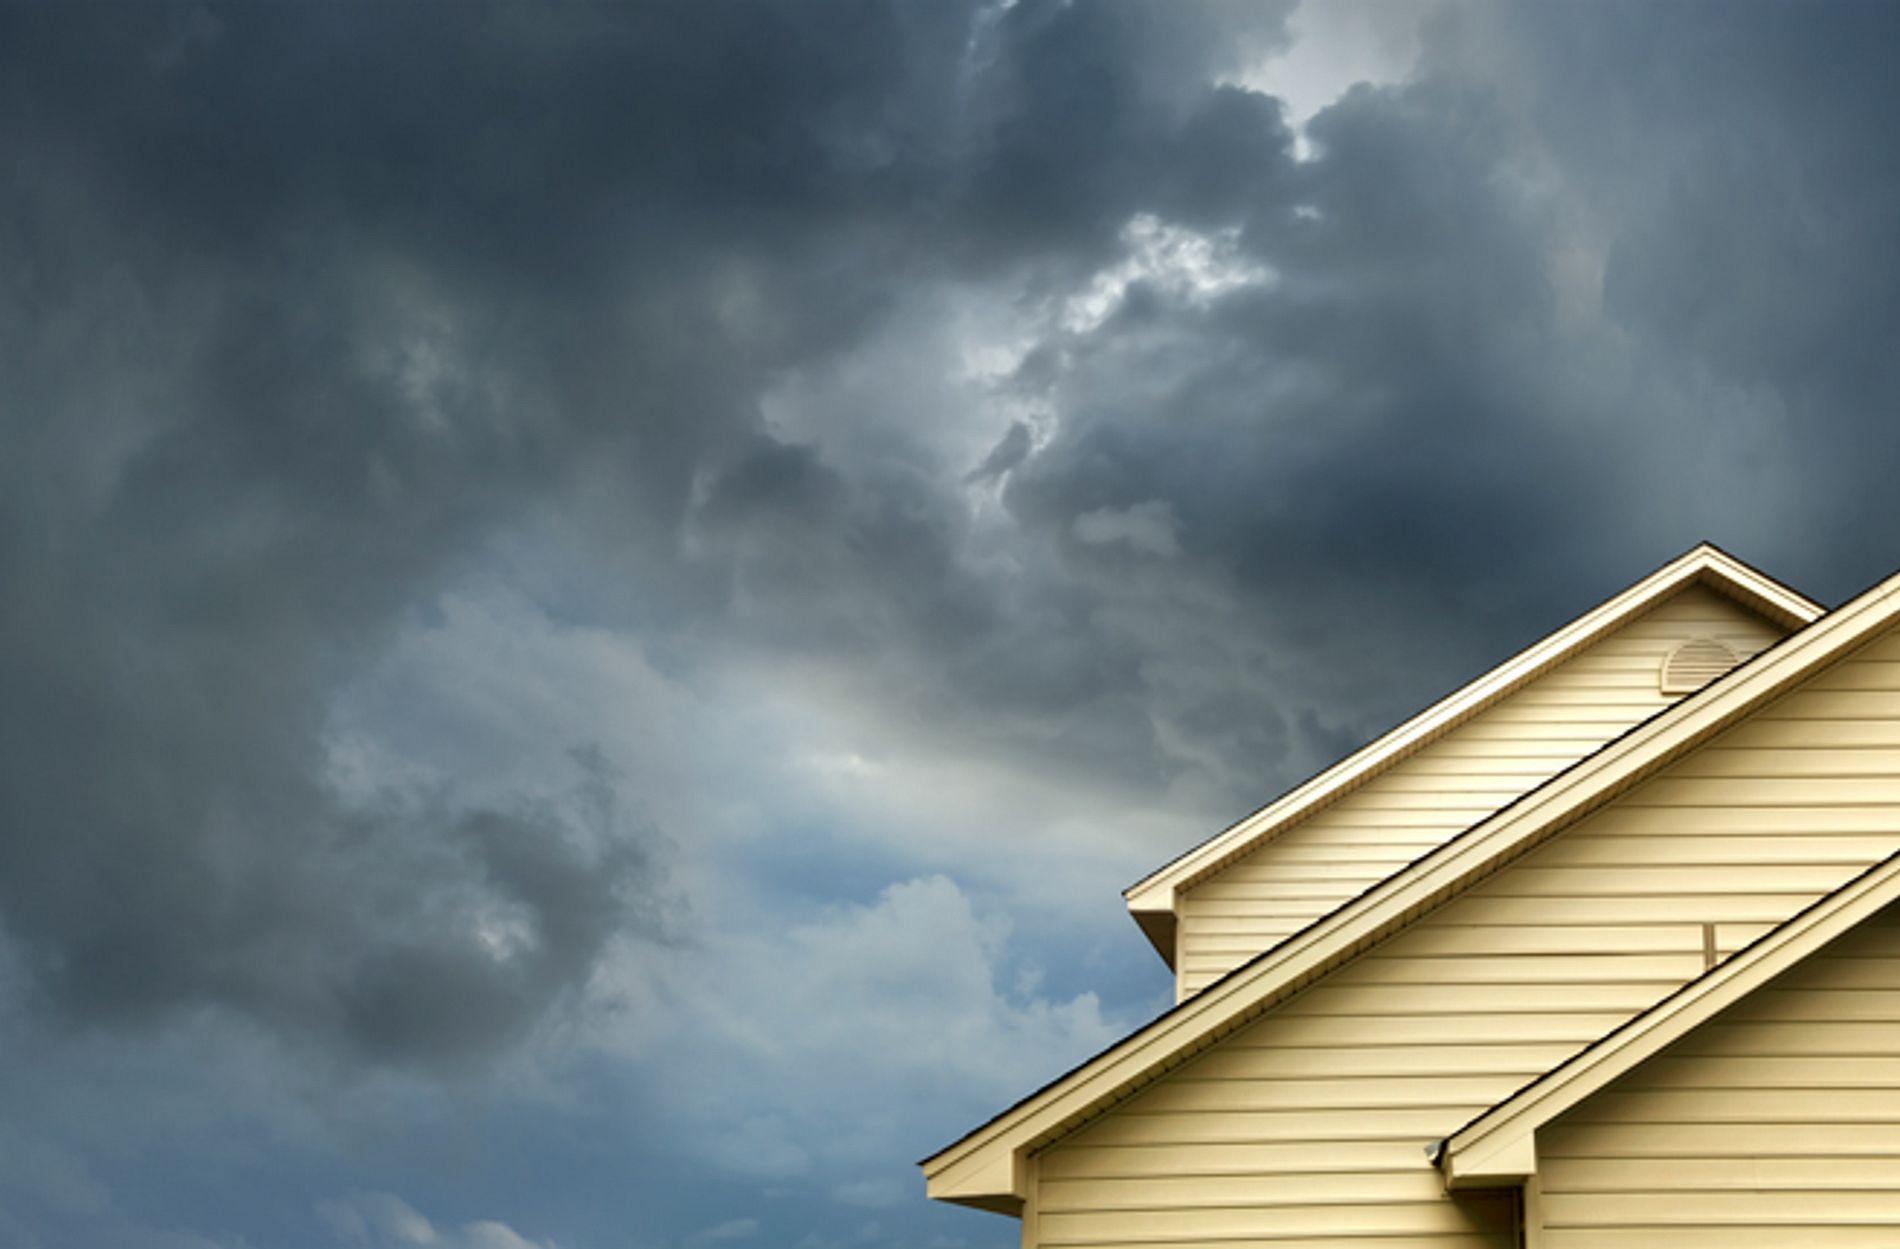 Cloudy sky over a home